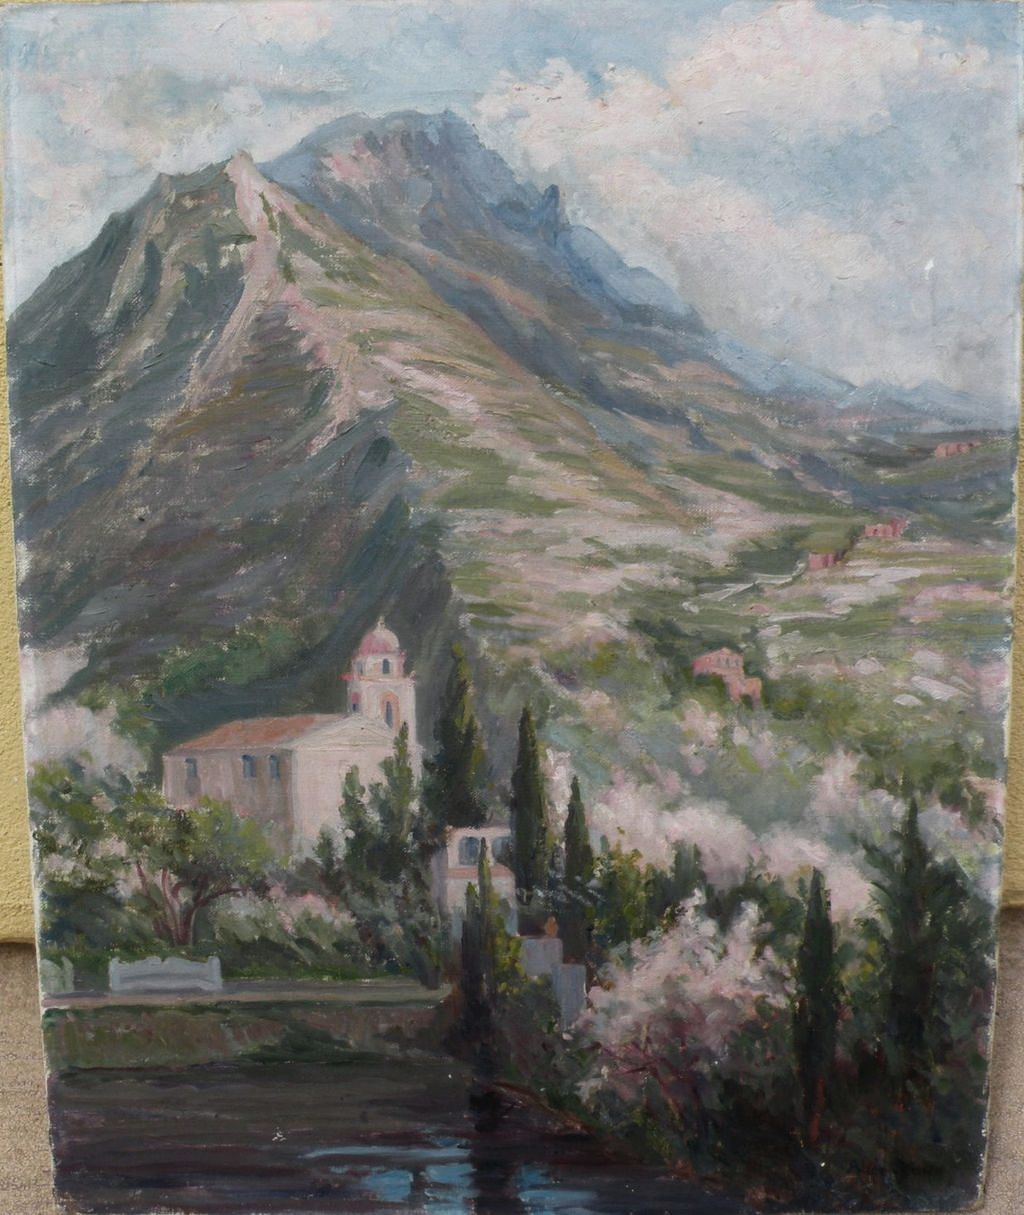 ALICE BALCH STONE (1876-1926) American impressionist artist painting of Italian landscape